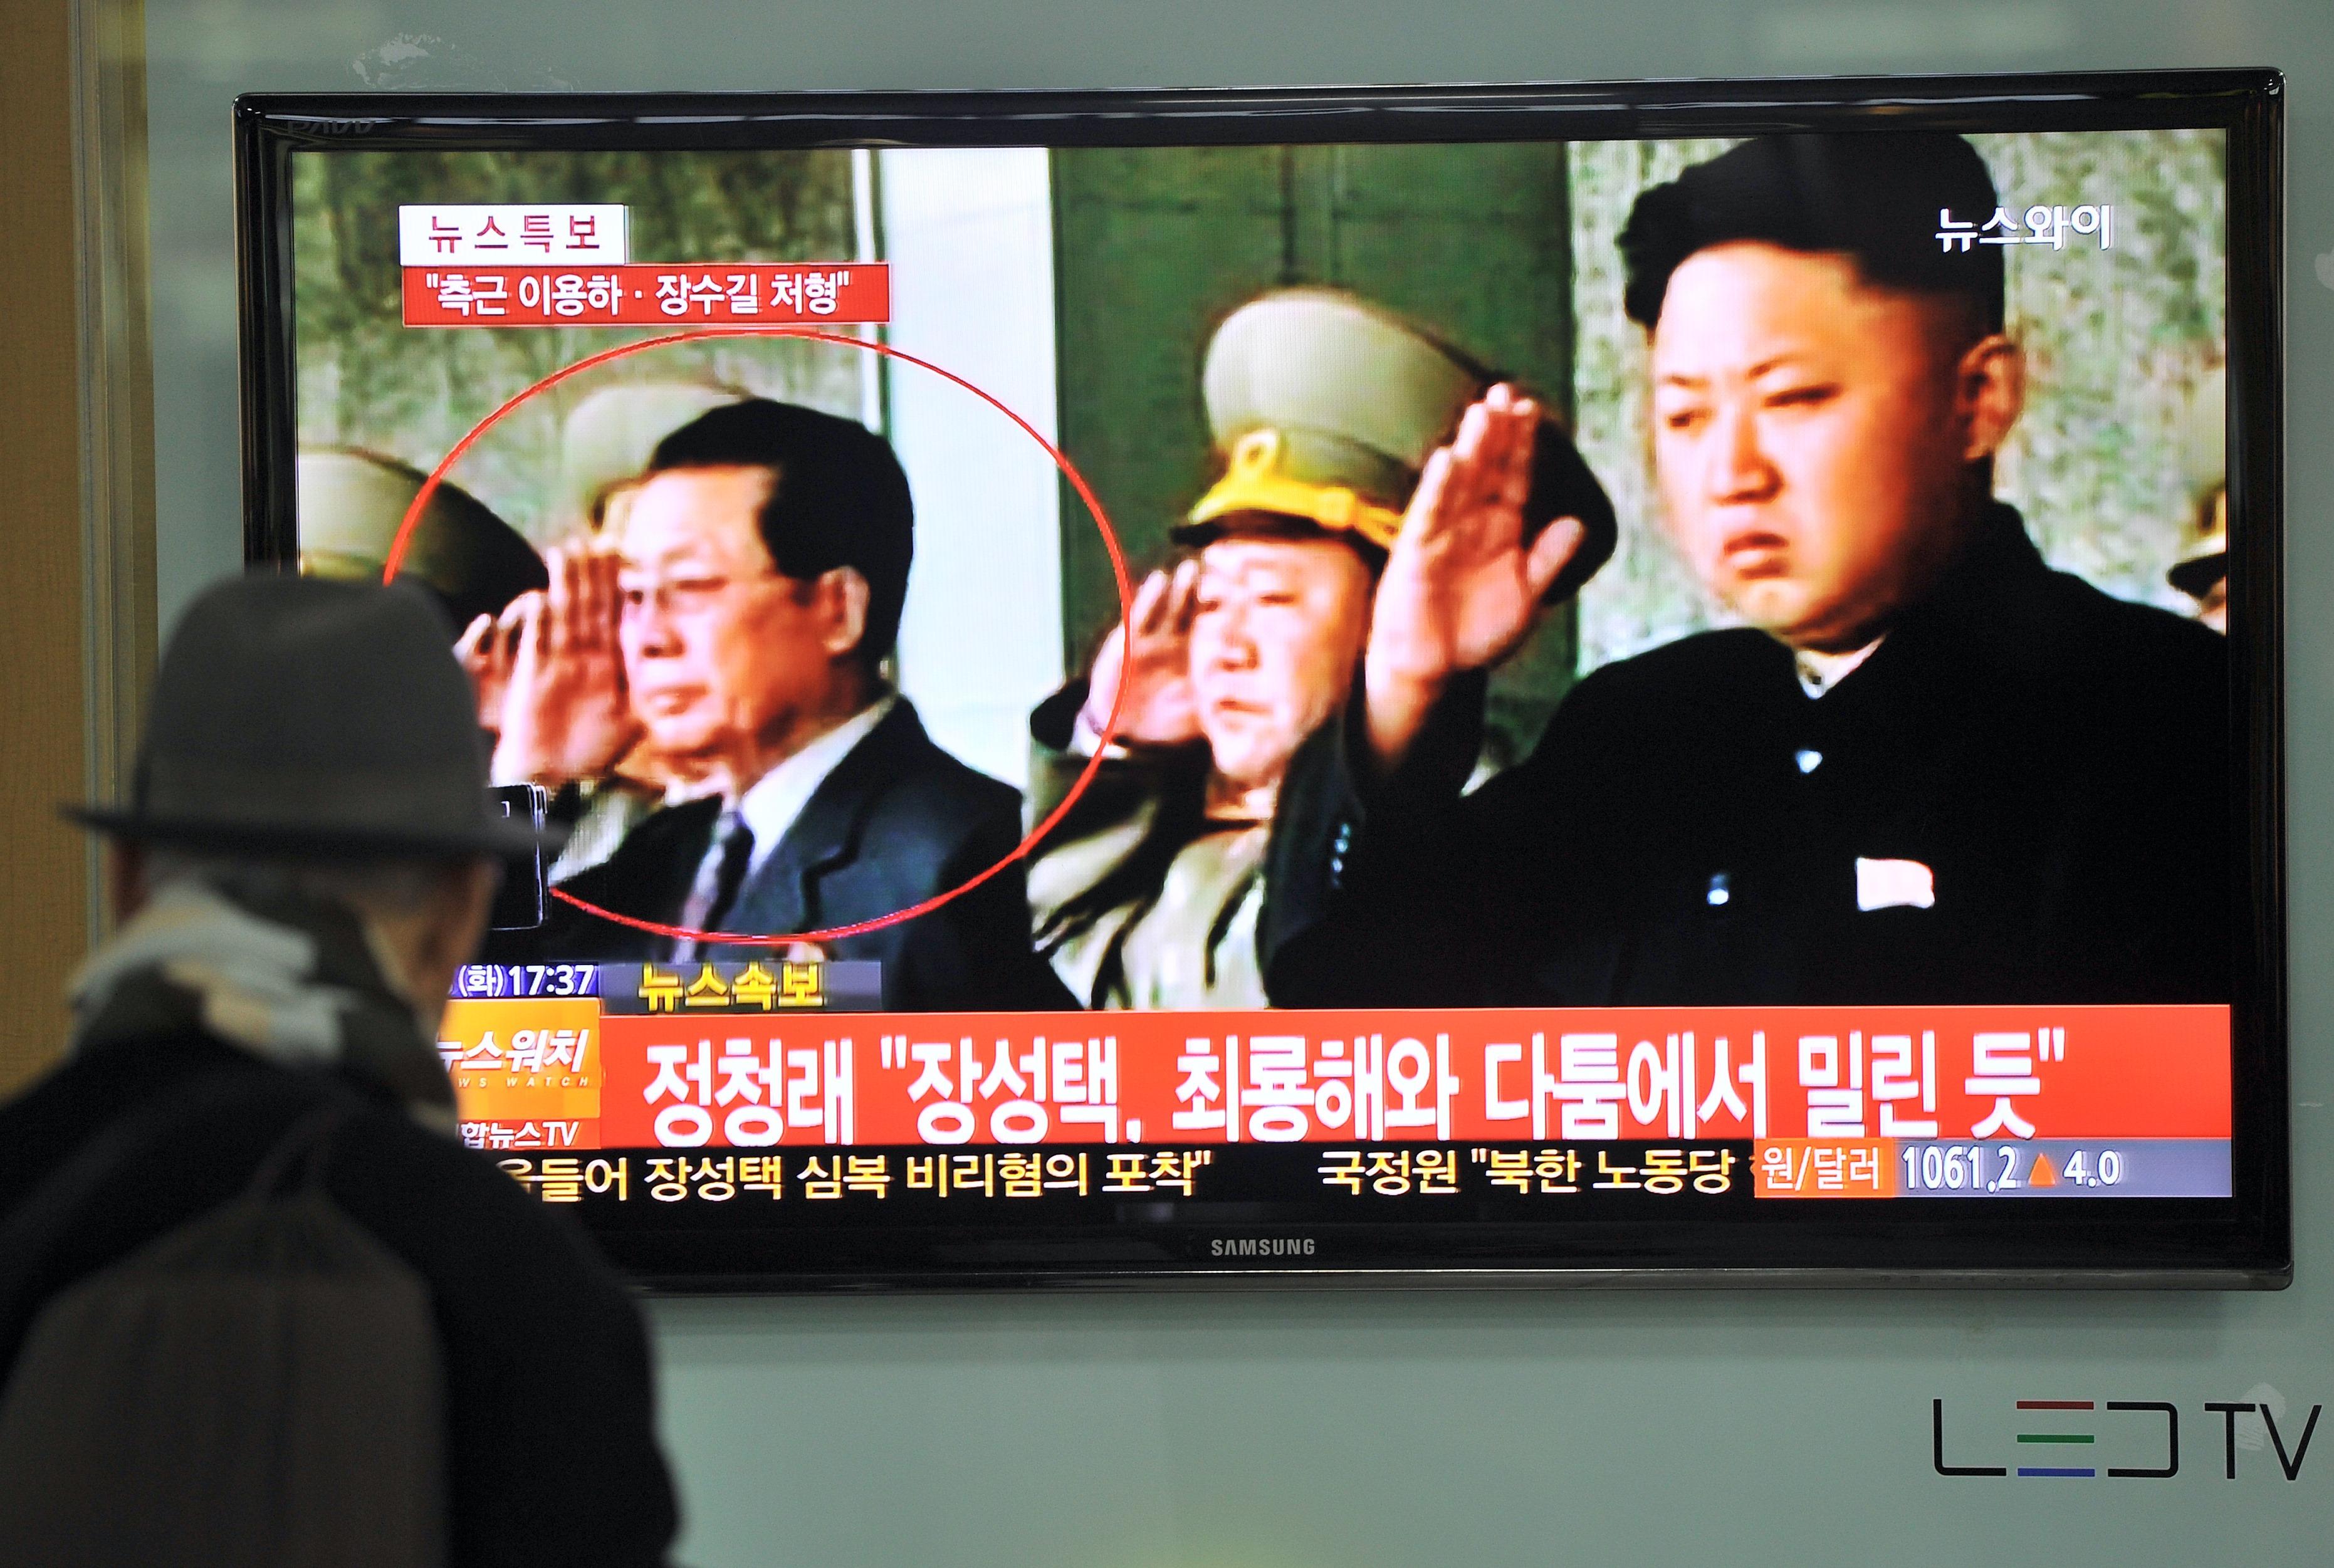 Is North Korea Just Making Idle Threats Again?